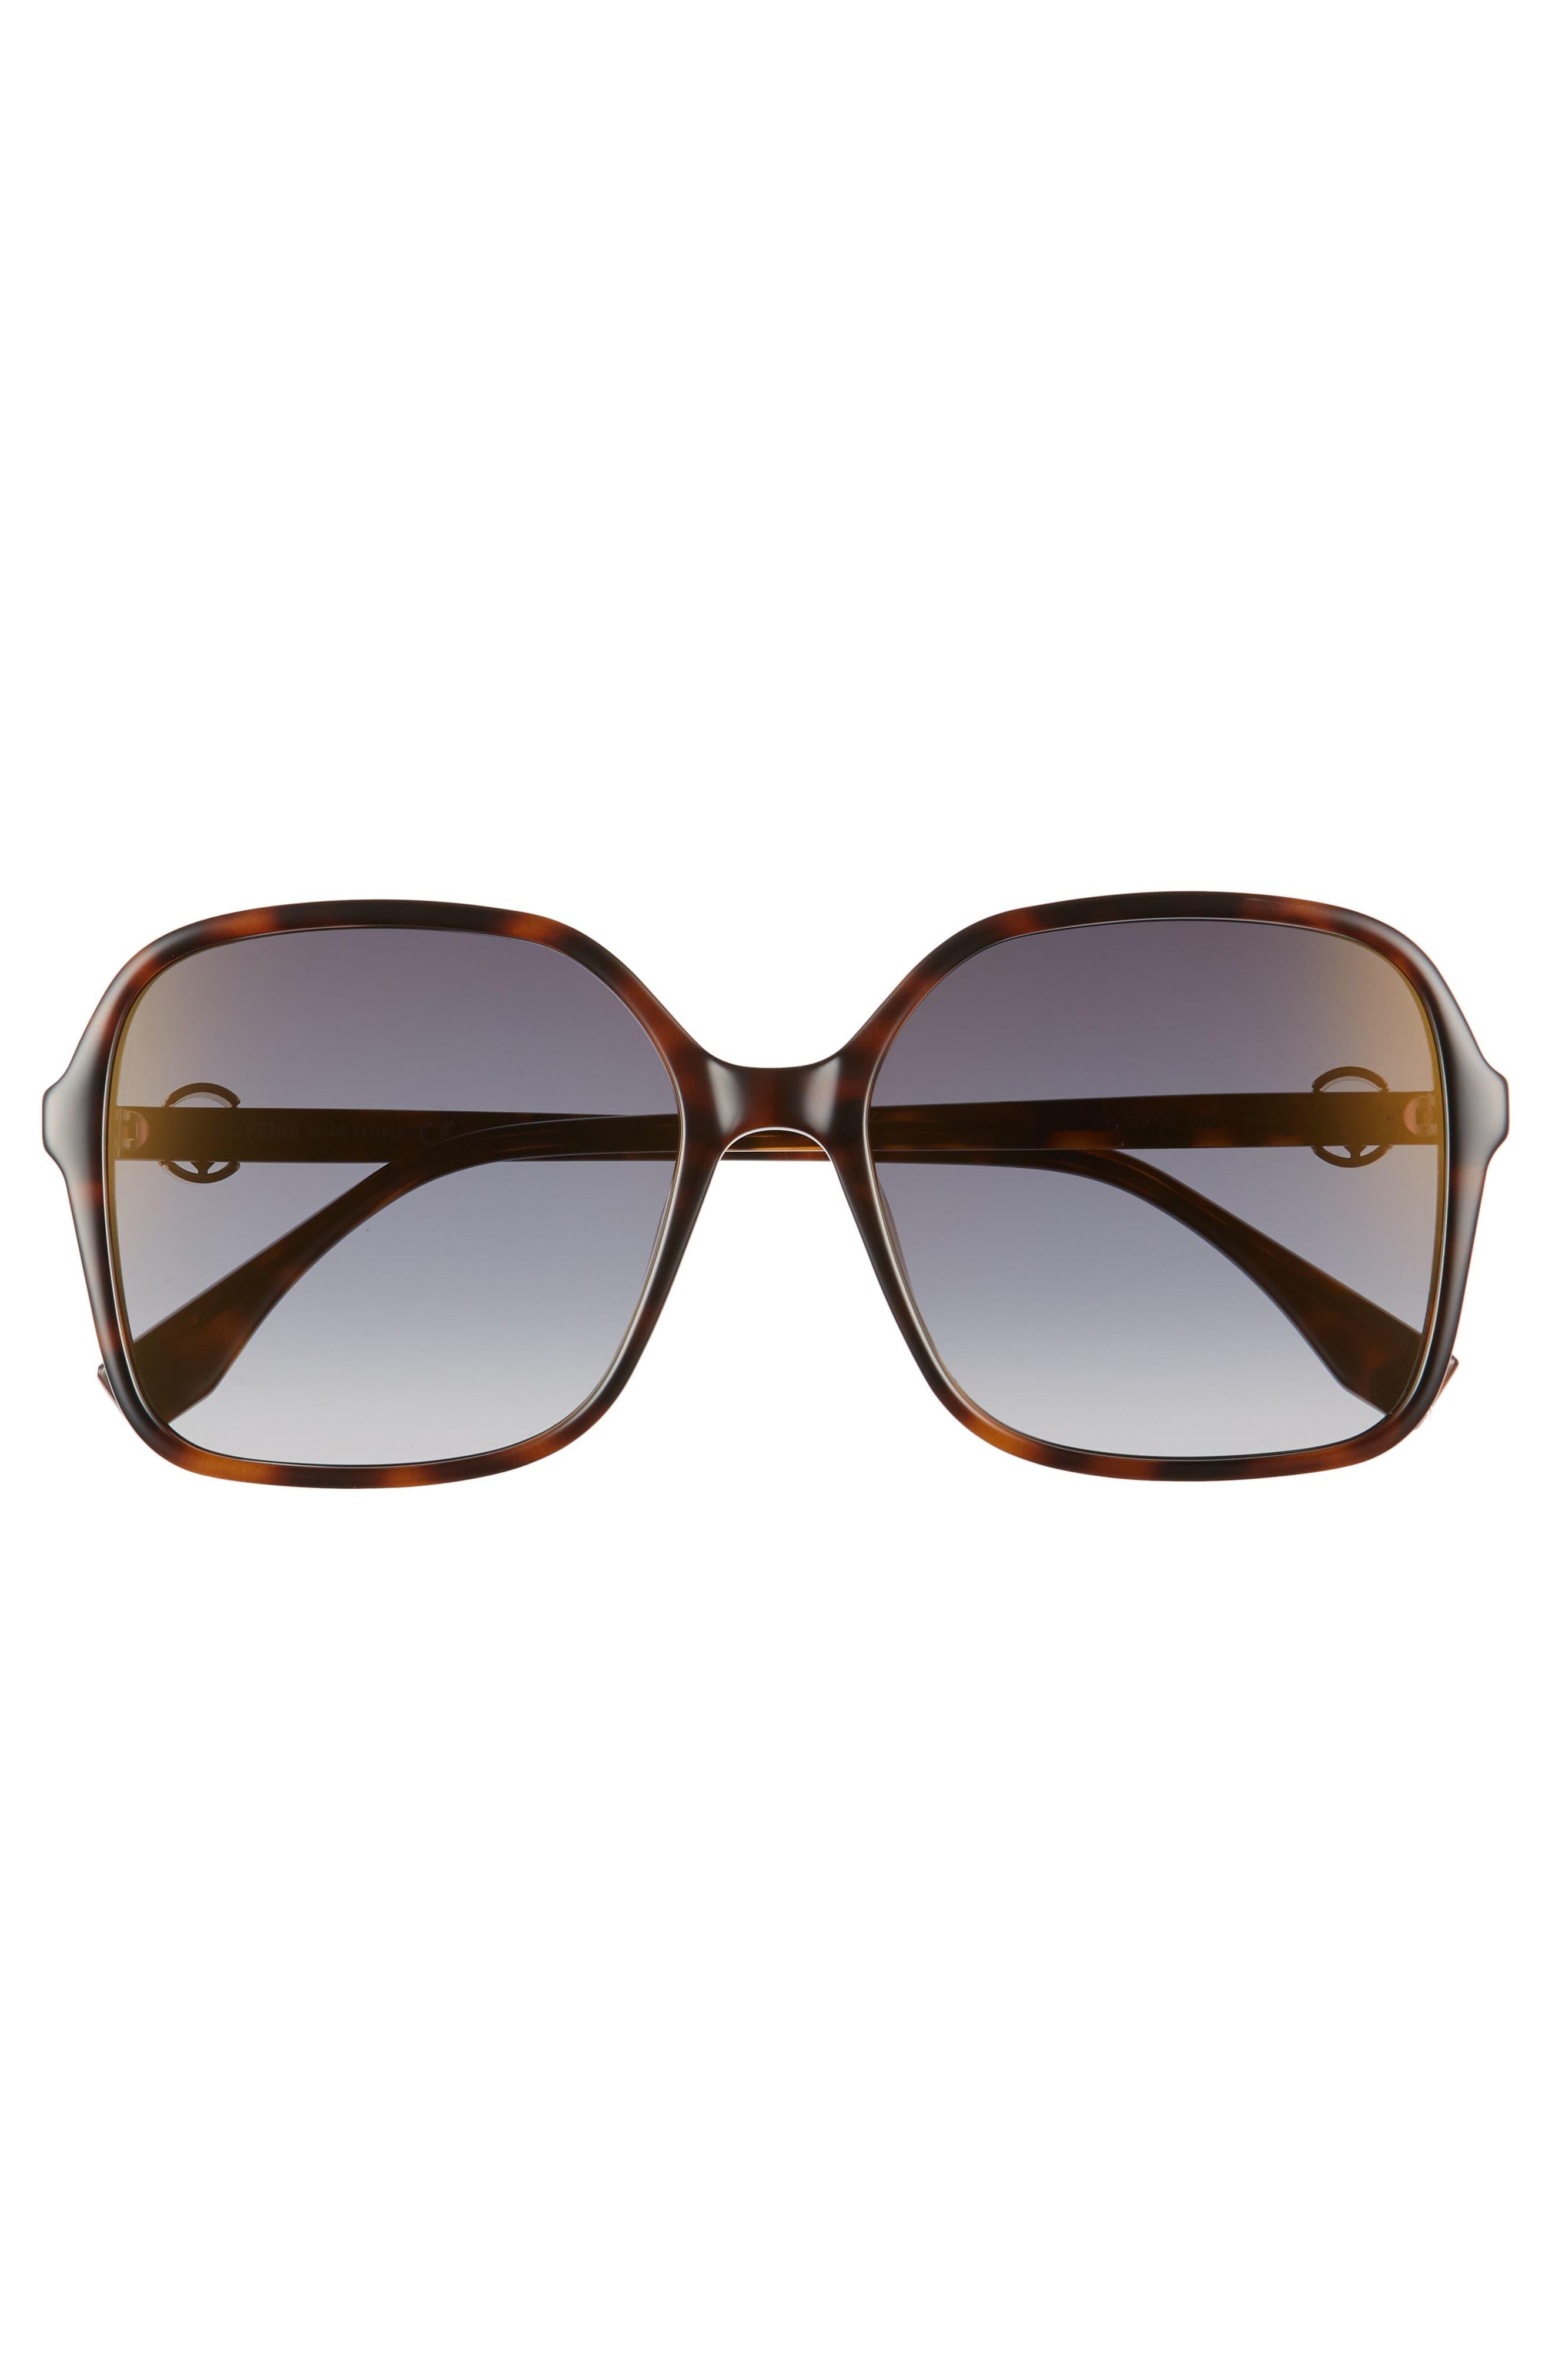 58mm Square Sunglasses,                             Alternate thumbnail 3, color,                             Dark Havana